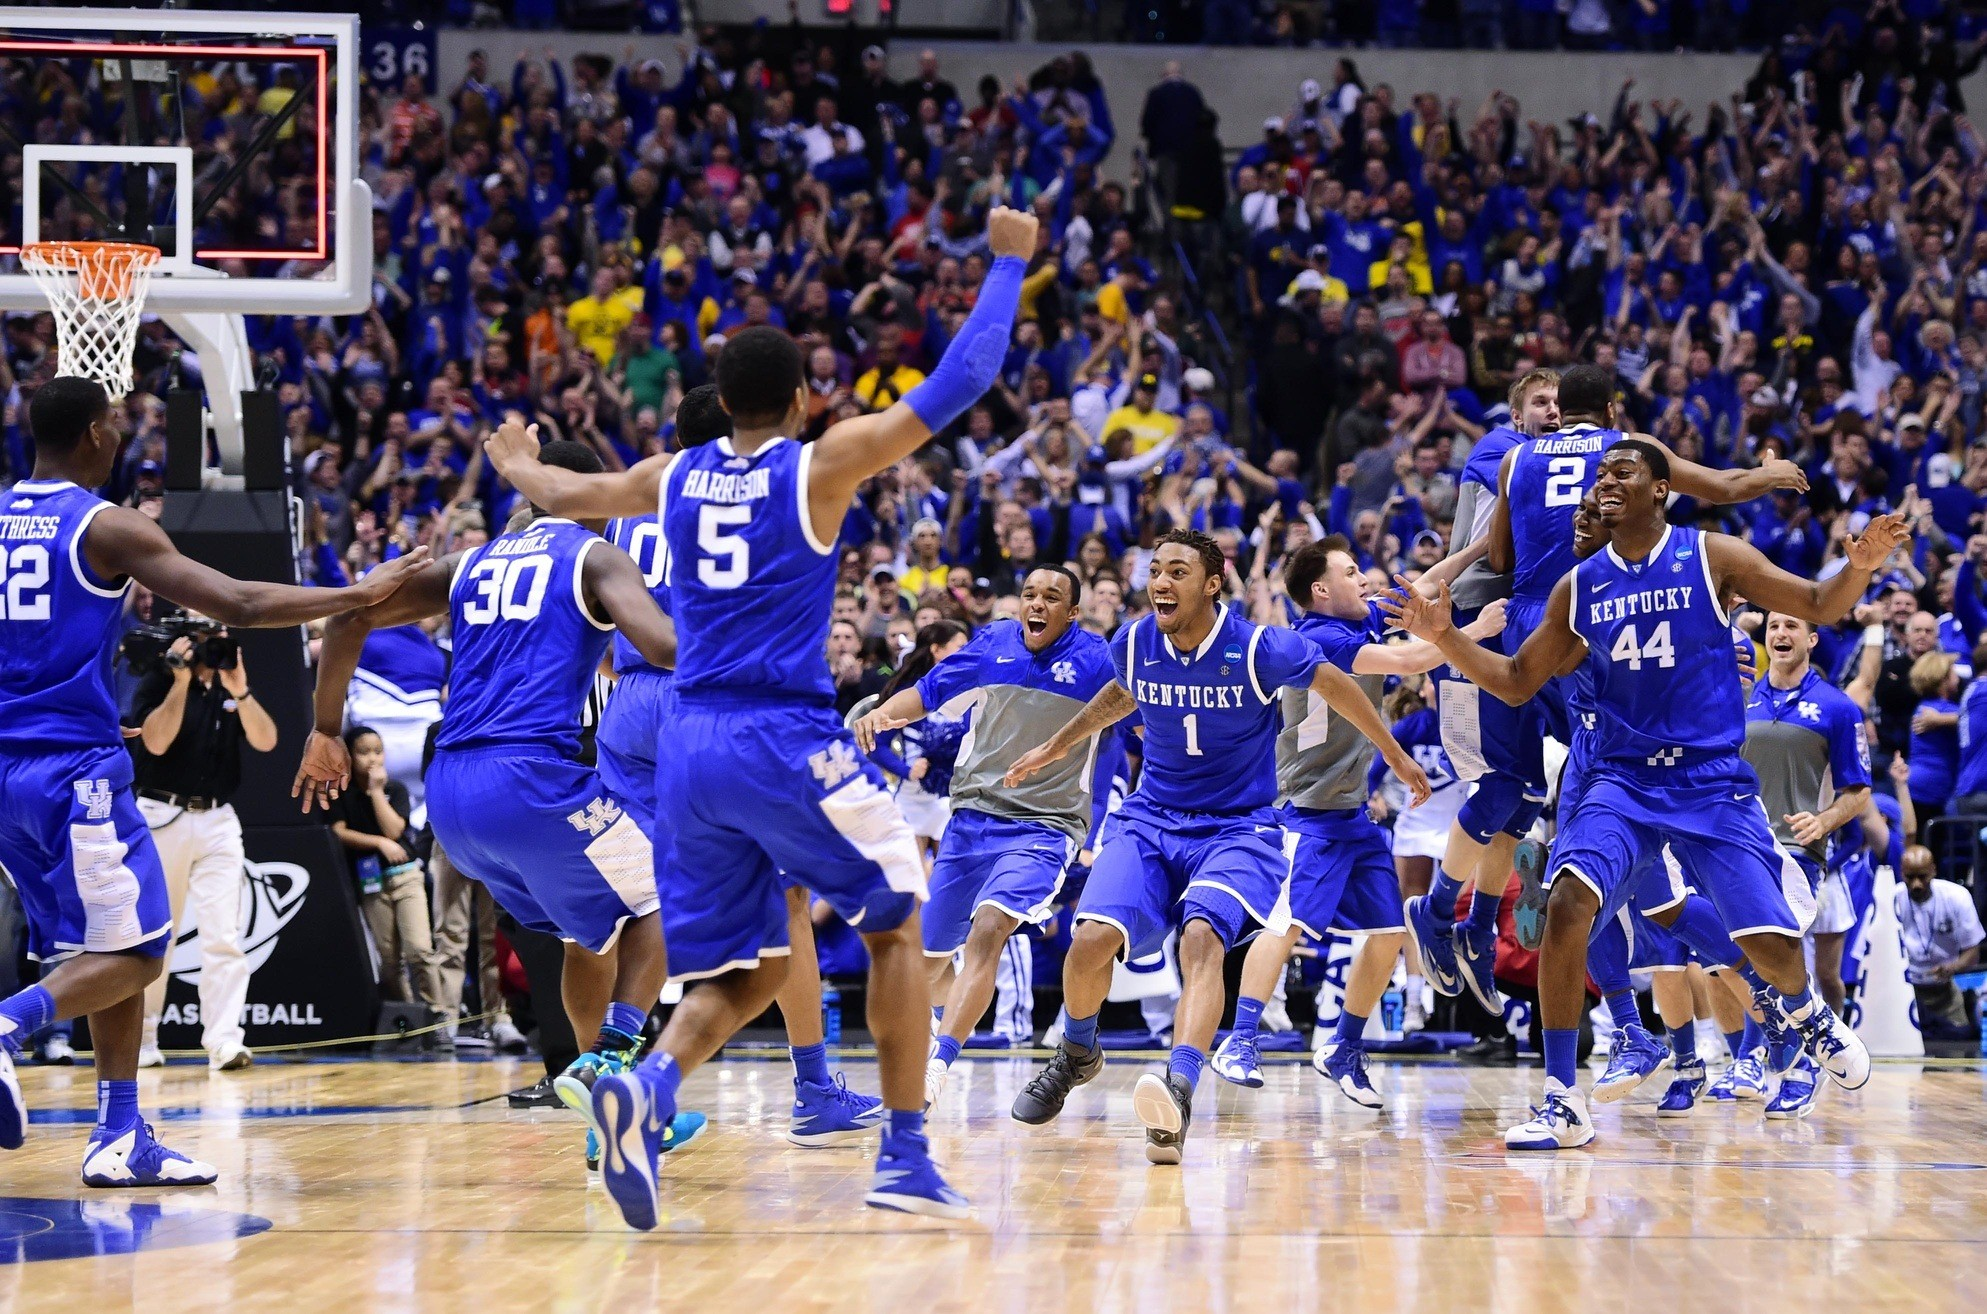 Kentucky Basketball Images Go Big Blue Hd Wallpaper And: Kentucky Basketball IPhone Wallpaper (55+ Images